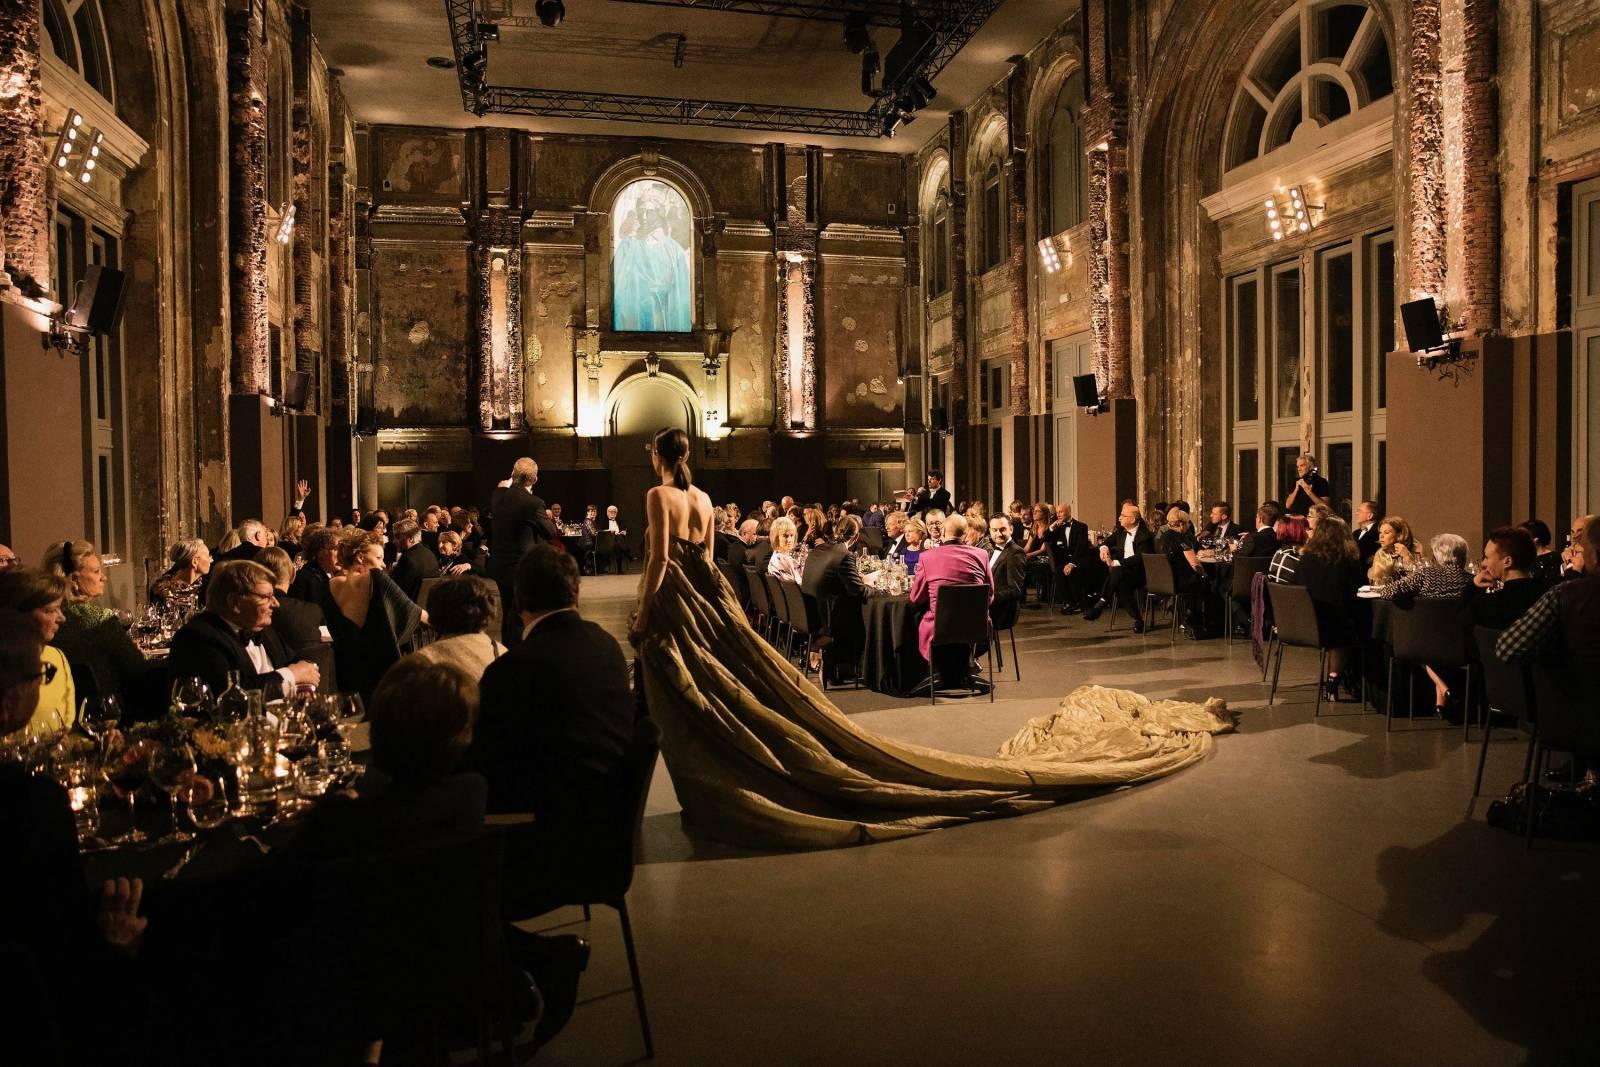 Zaal AthenA - Feestzaal - Trouwzaal - Antwerpen - House of Weddings - 50